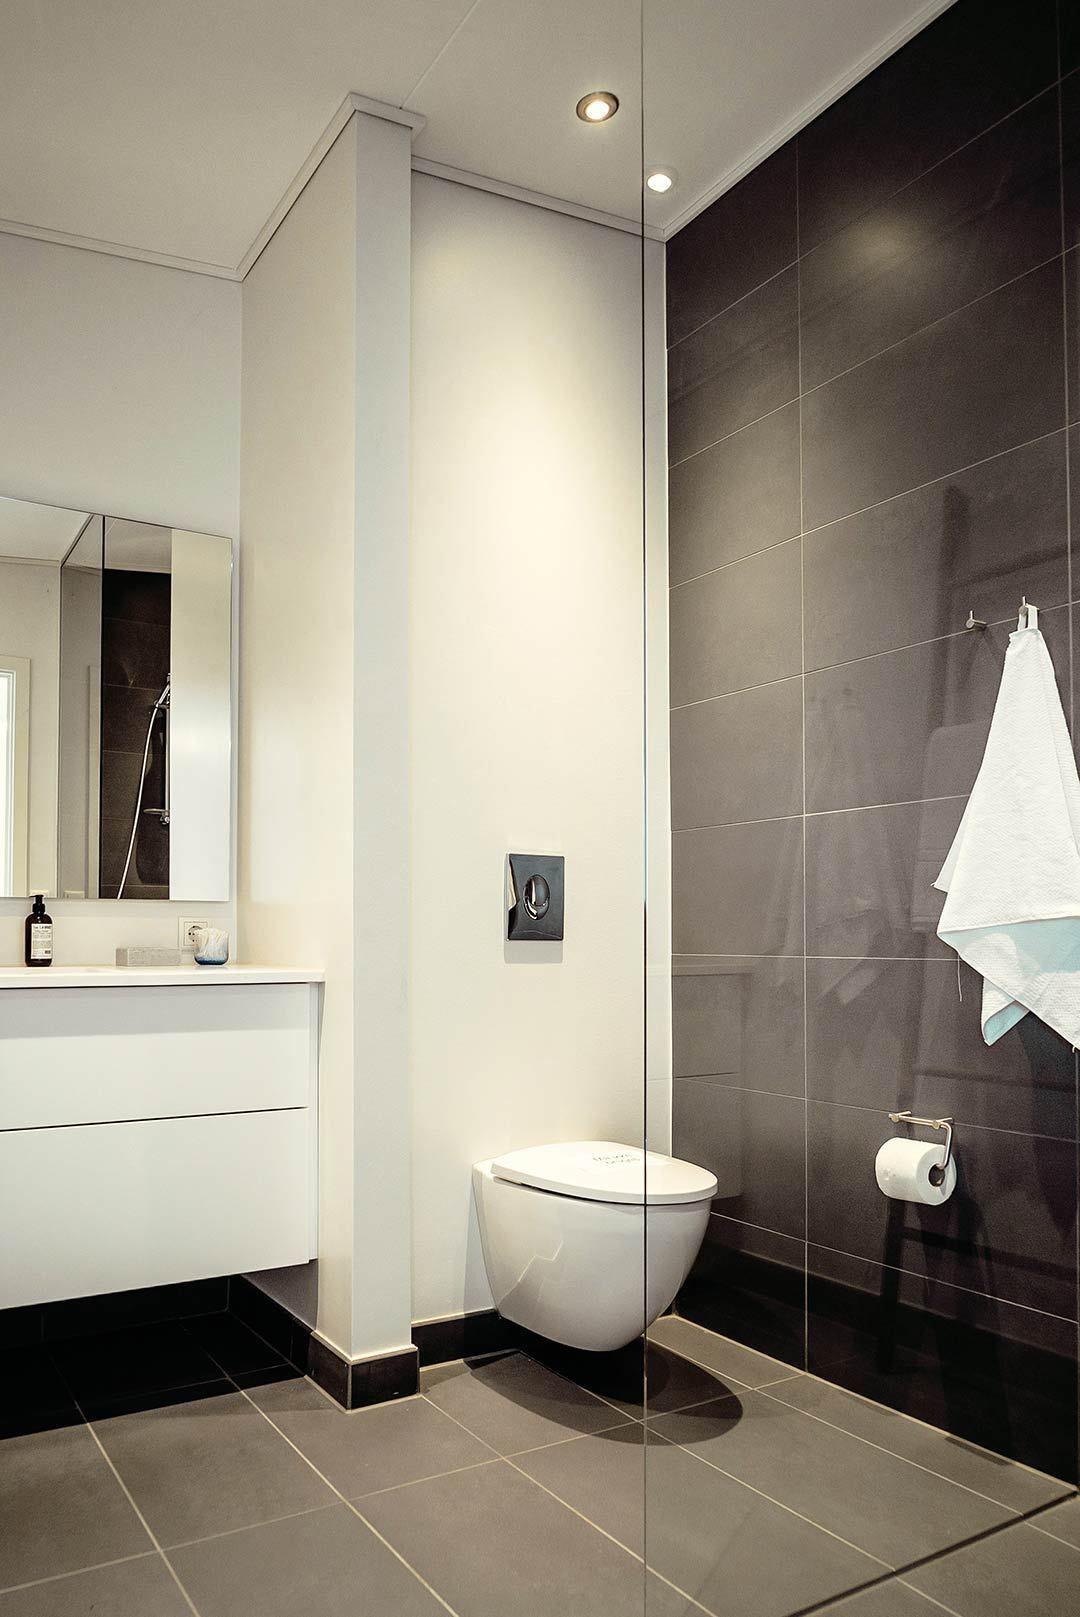 Kilehusene: Show house decorated by that nordic feeling   bathrooms ...